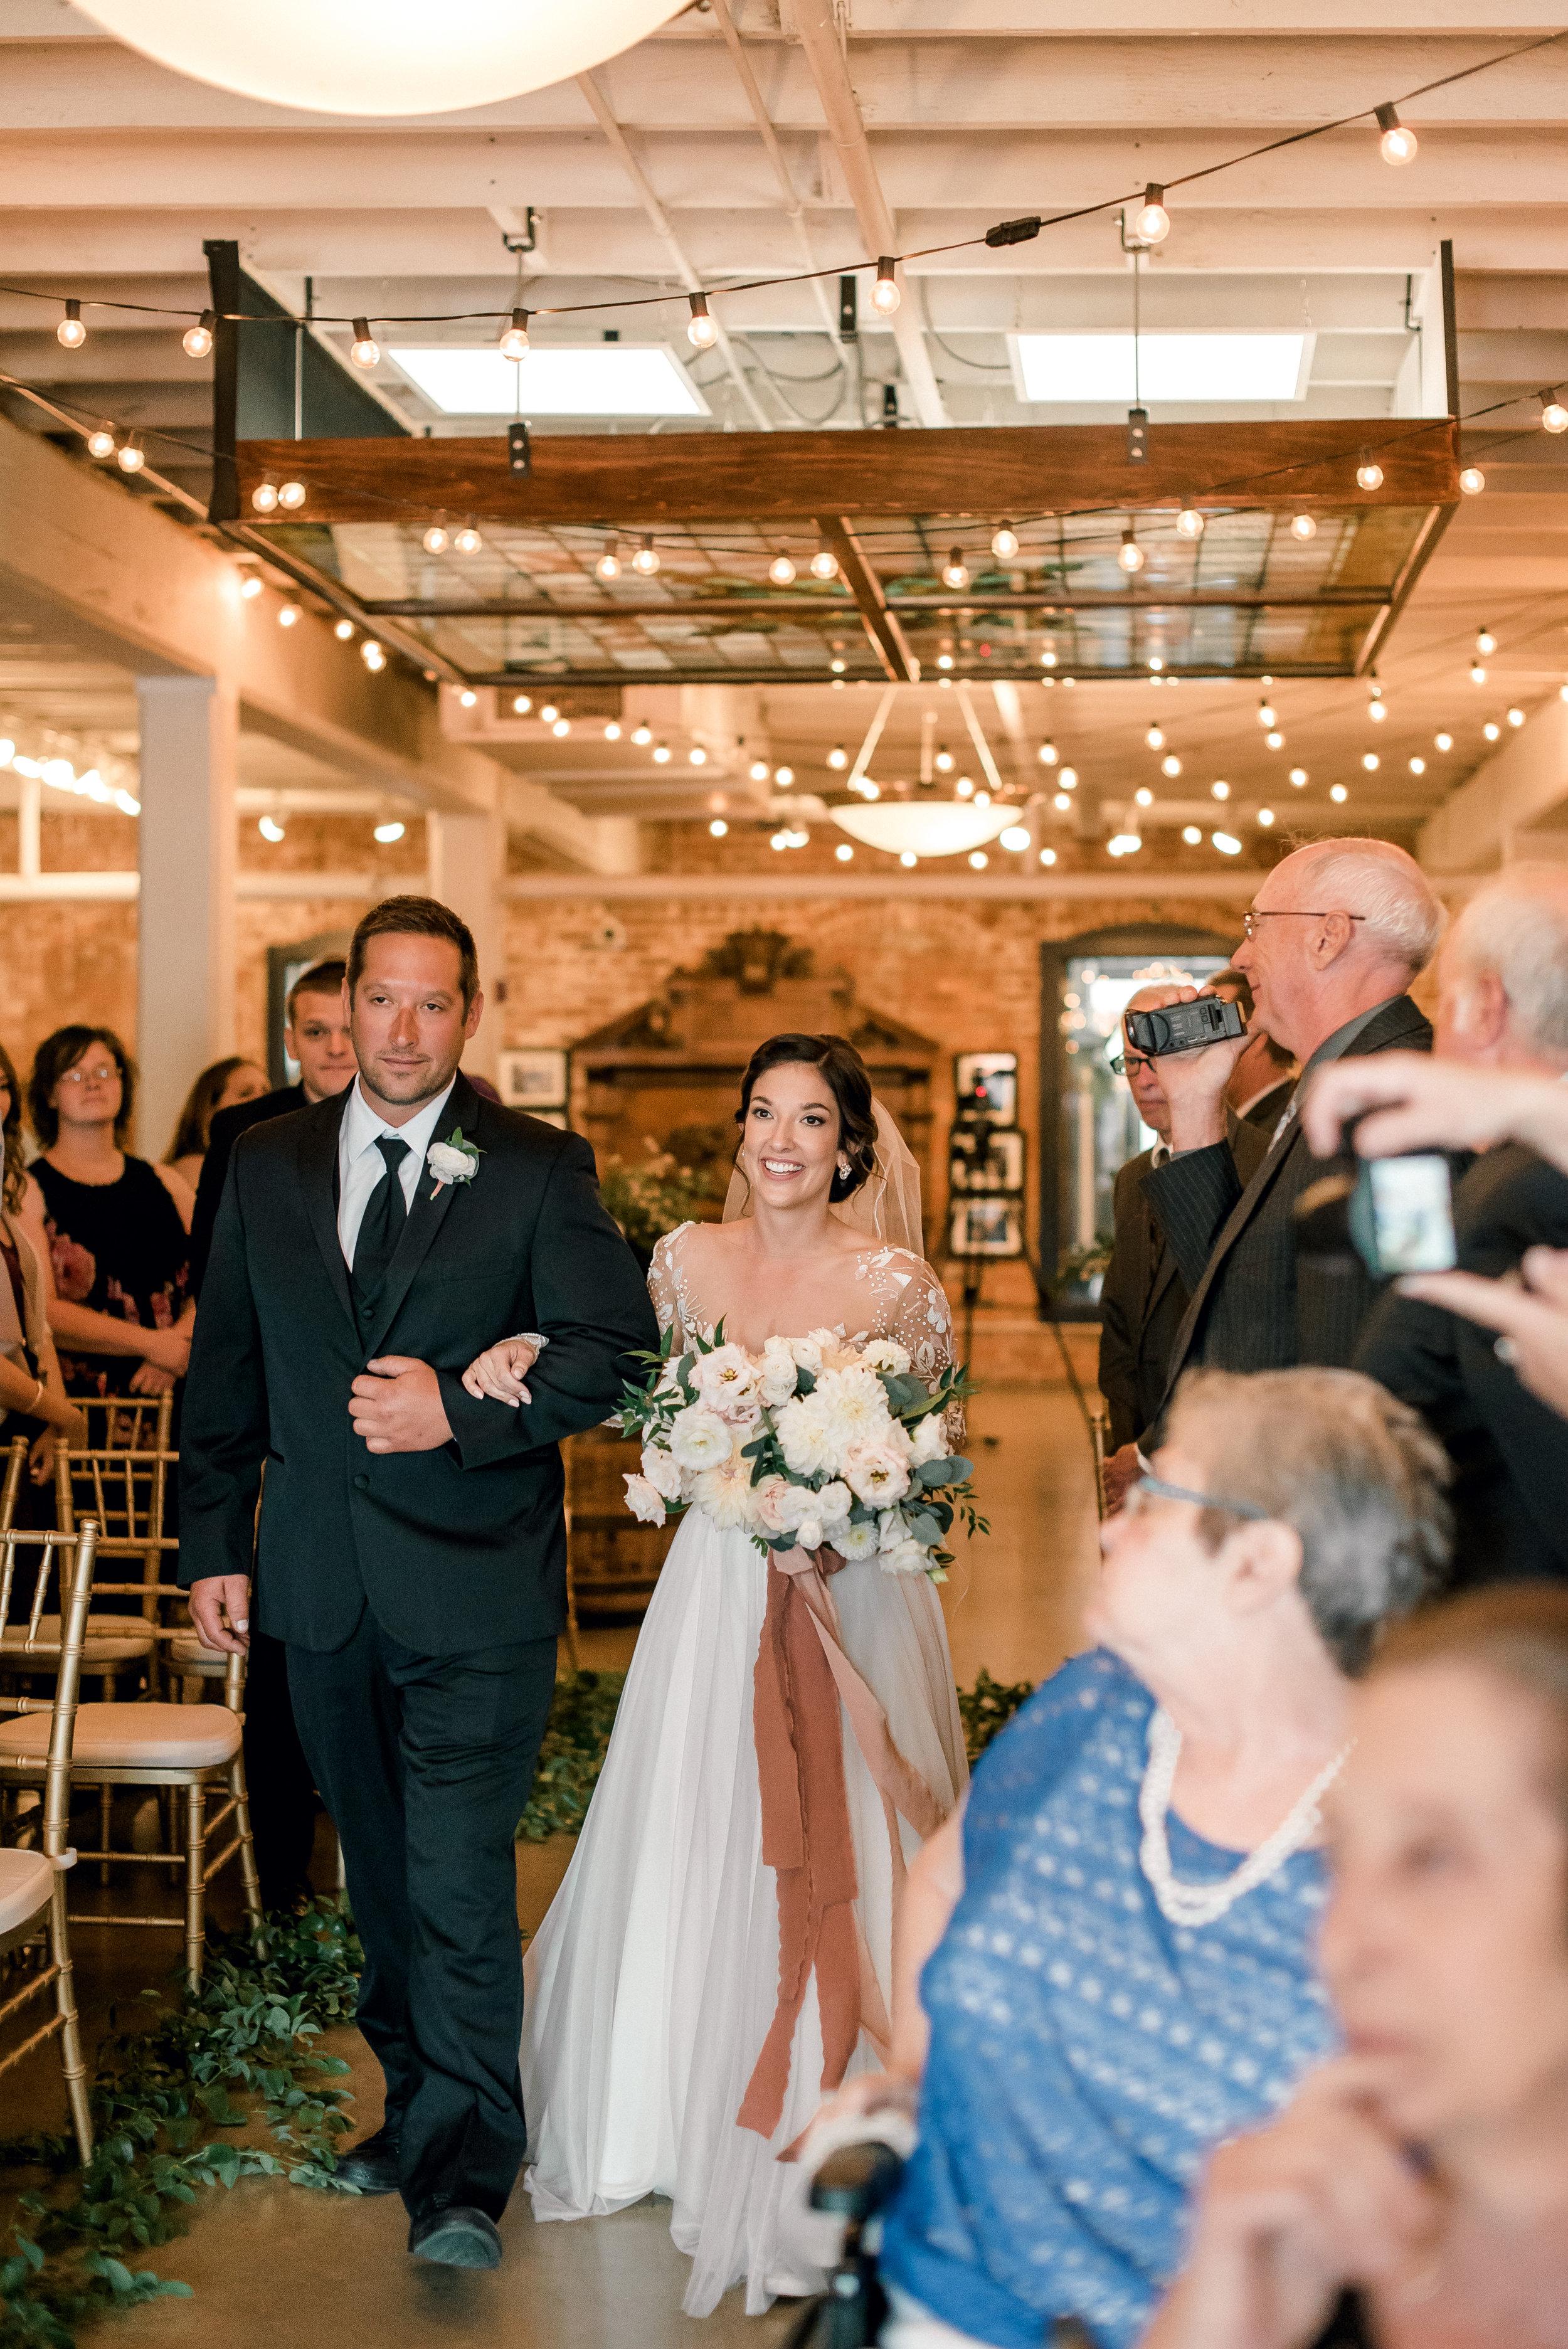 cleveland-wedding-photographer-great-lakes-brewing-arcade-0036.jpg